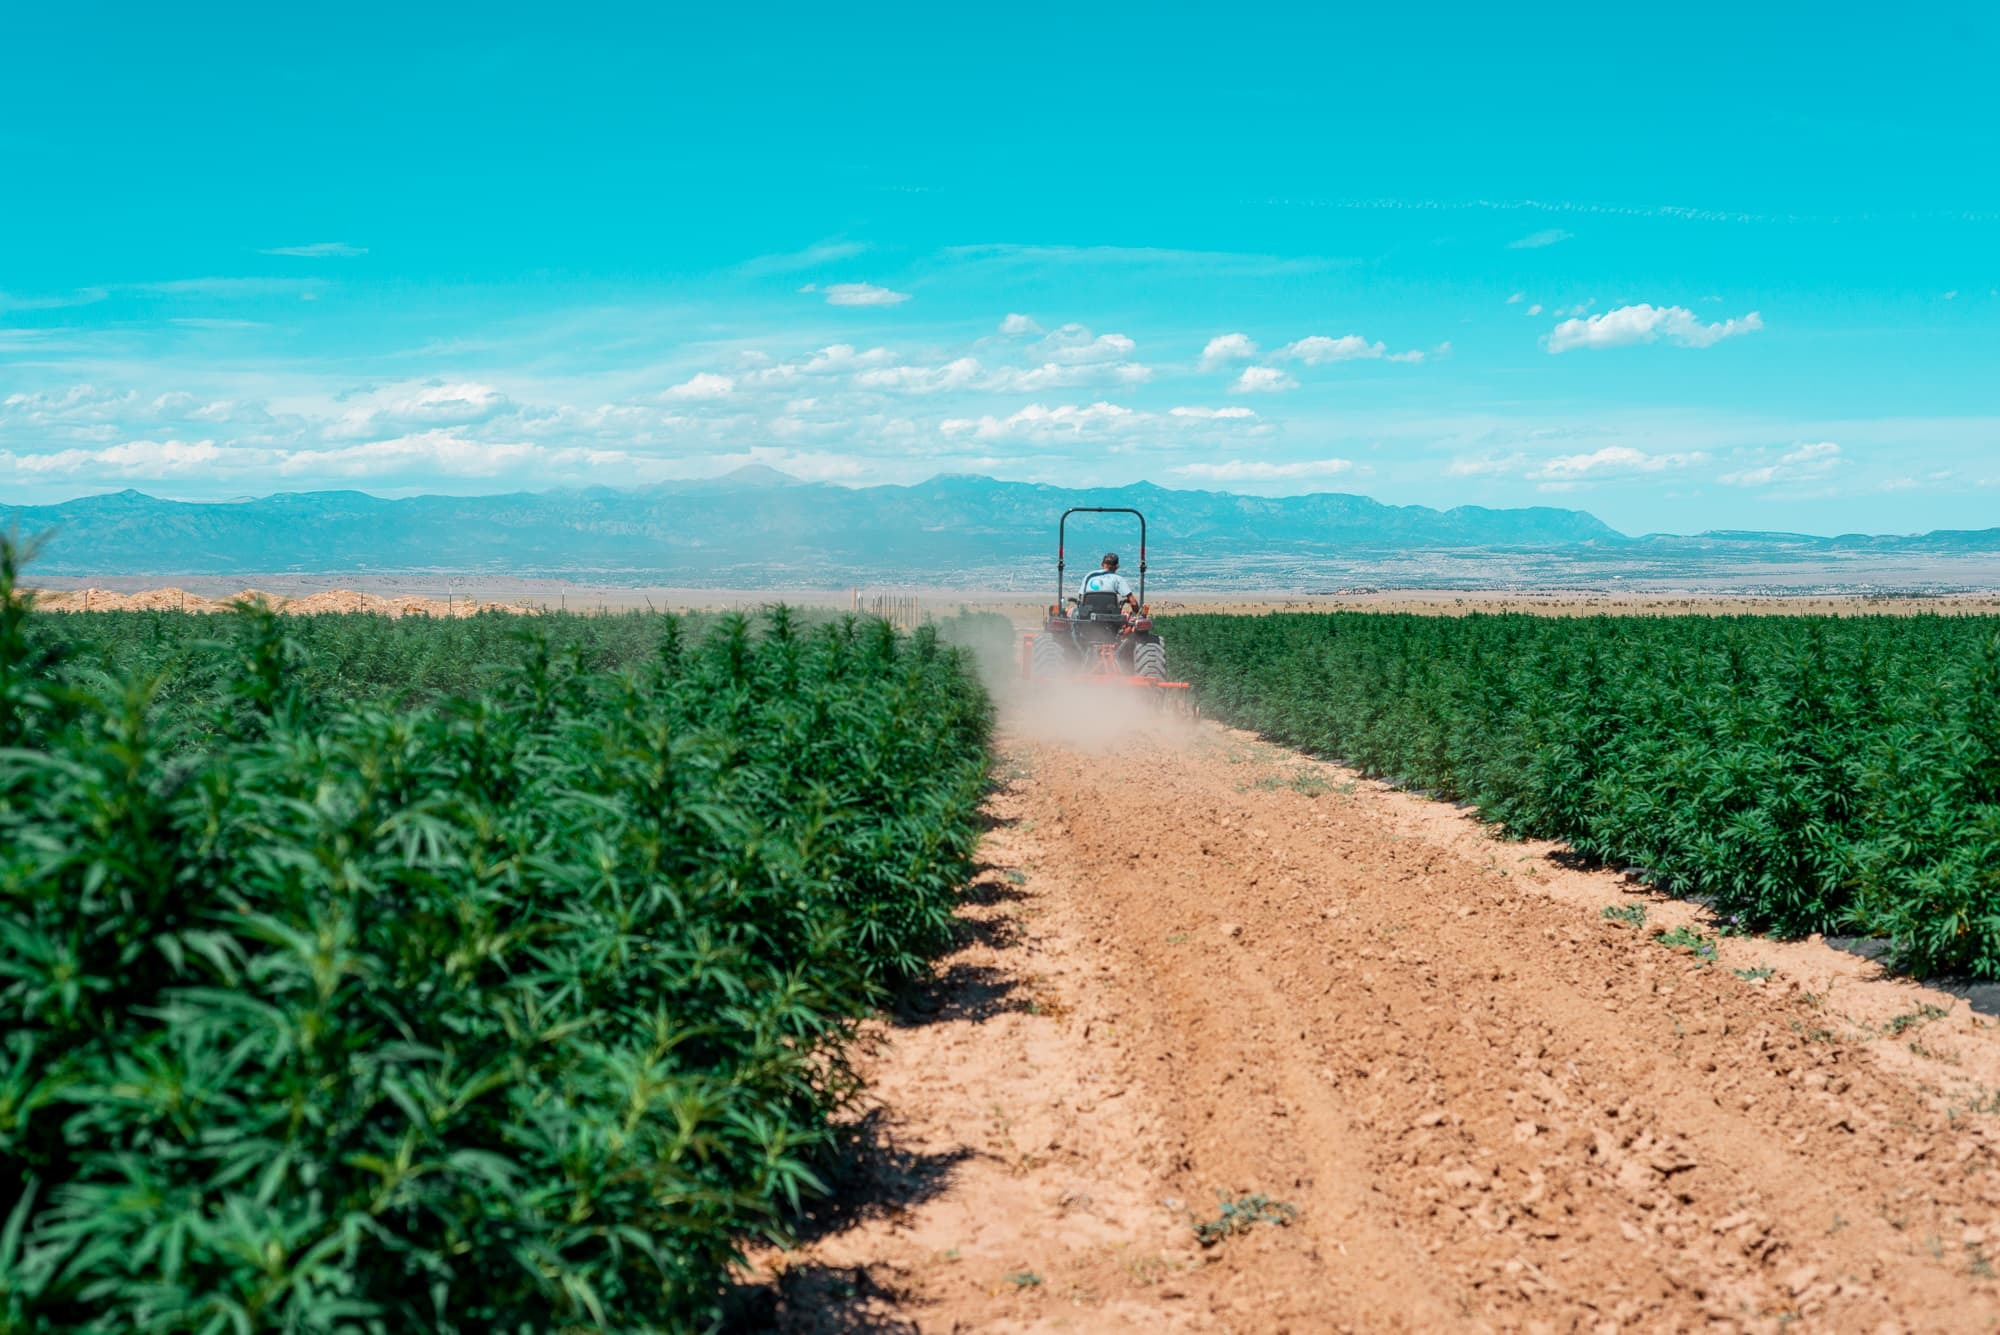 Veritas Farms | More Than Just CBD